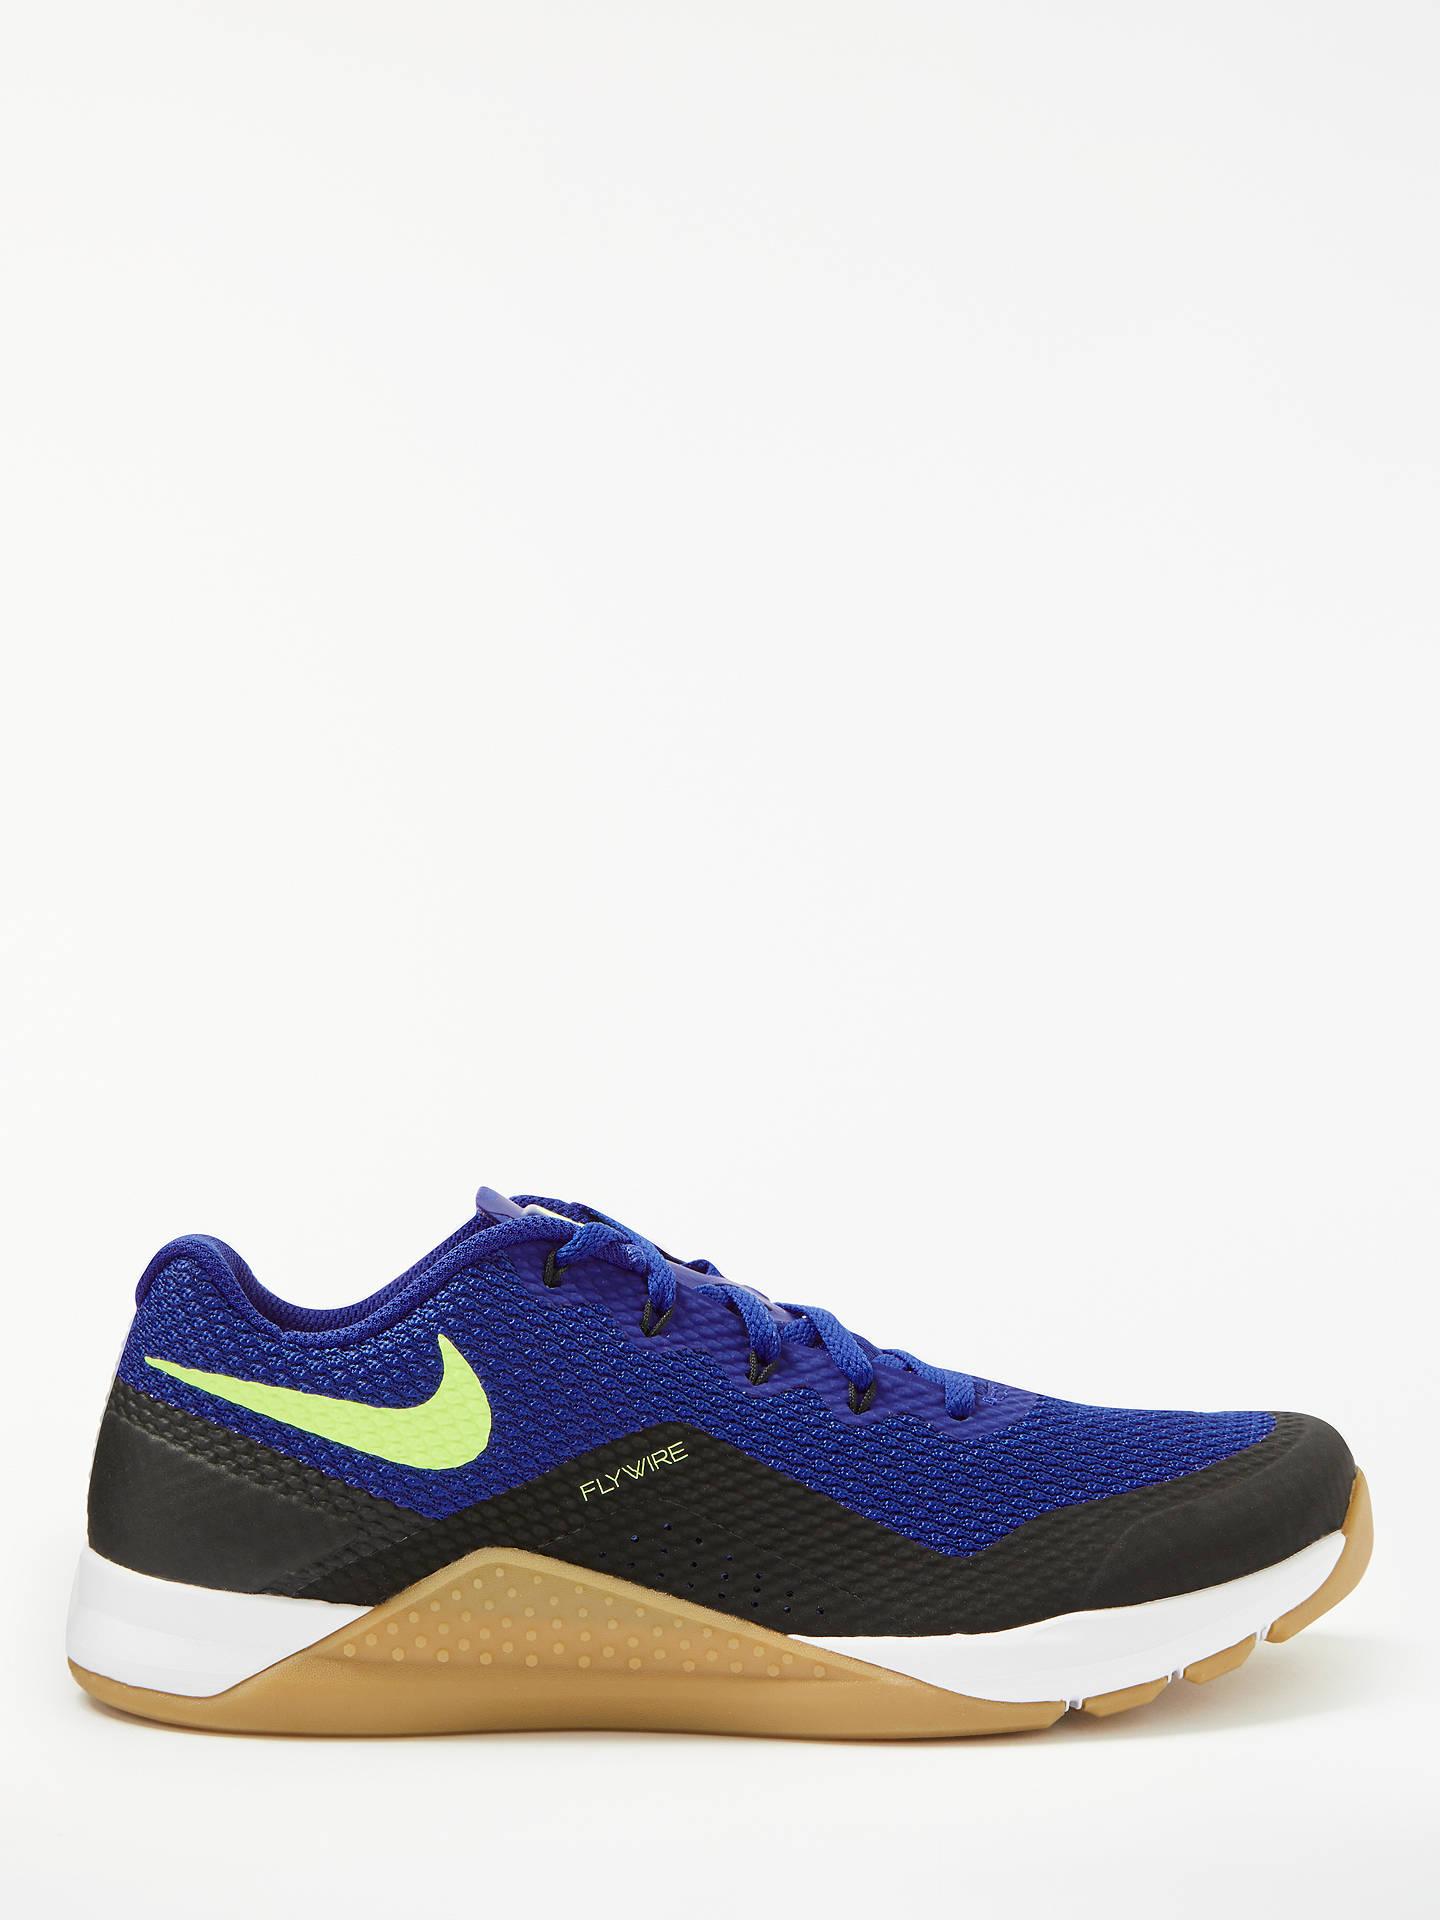 4d087122bd030 Buy Nike Metcon Repper DSX Men s Training Shoes